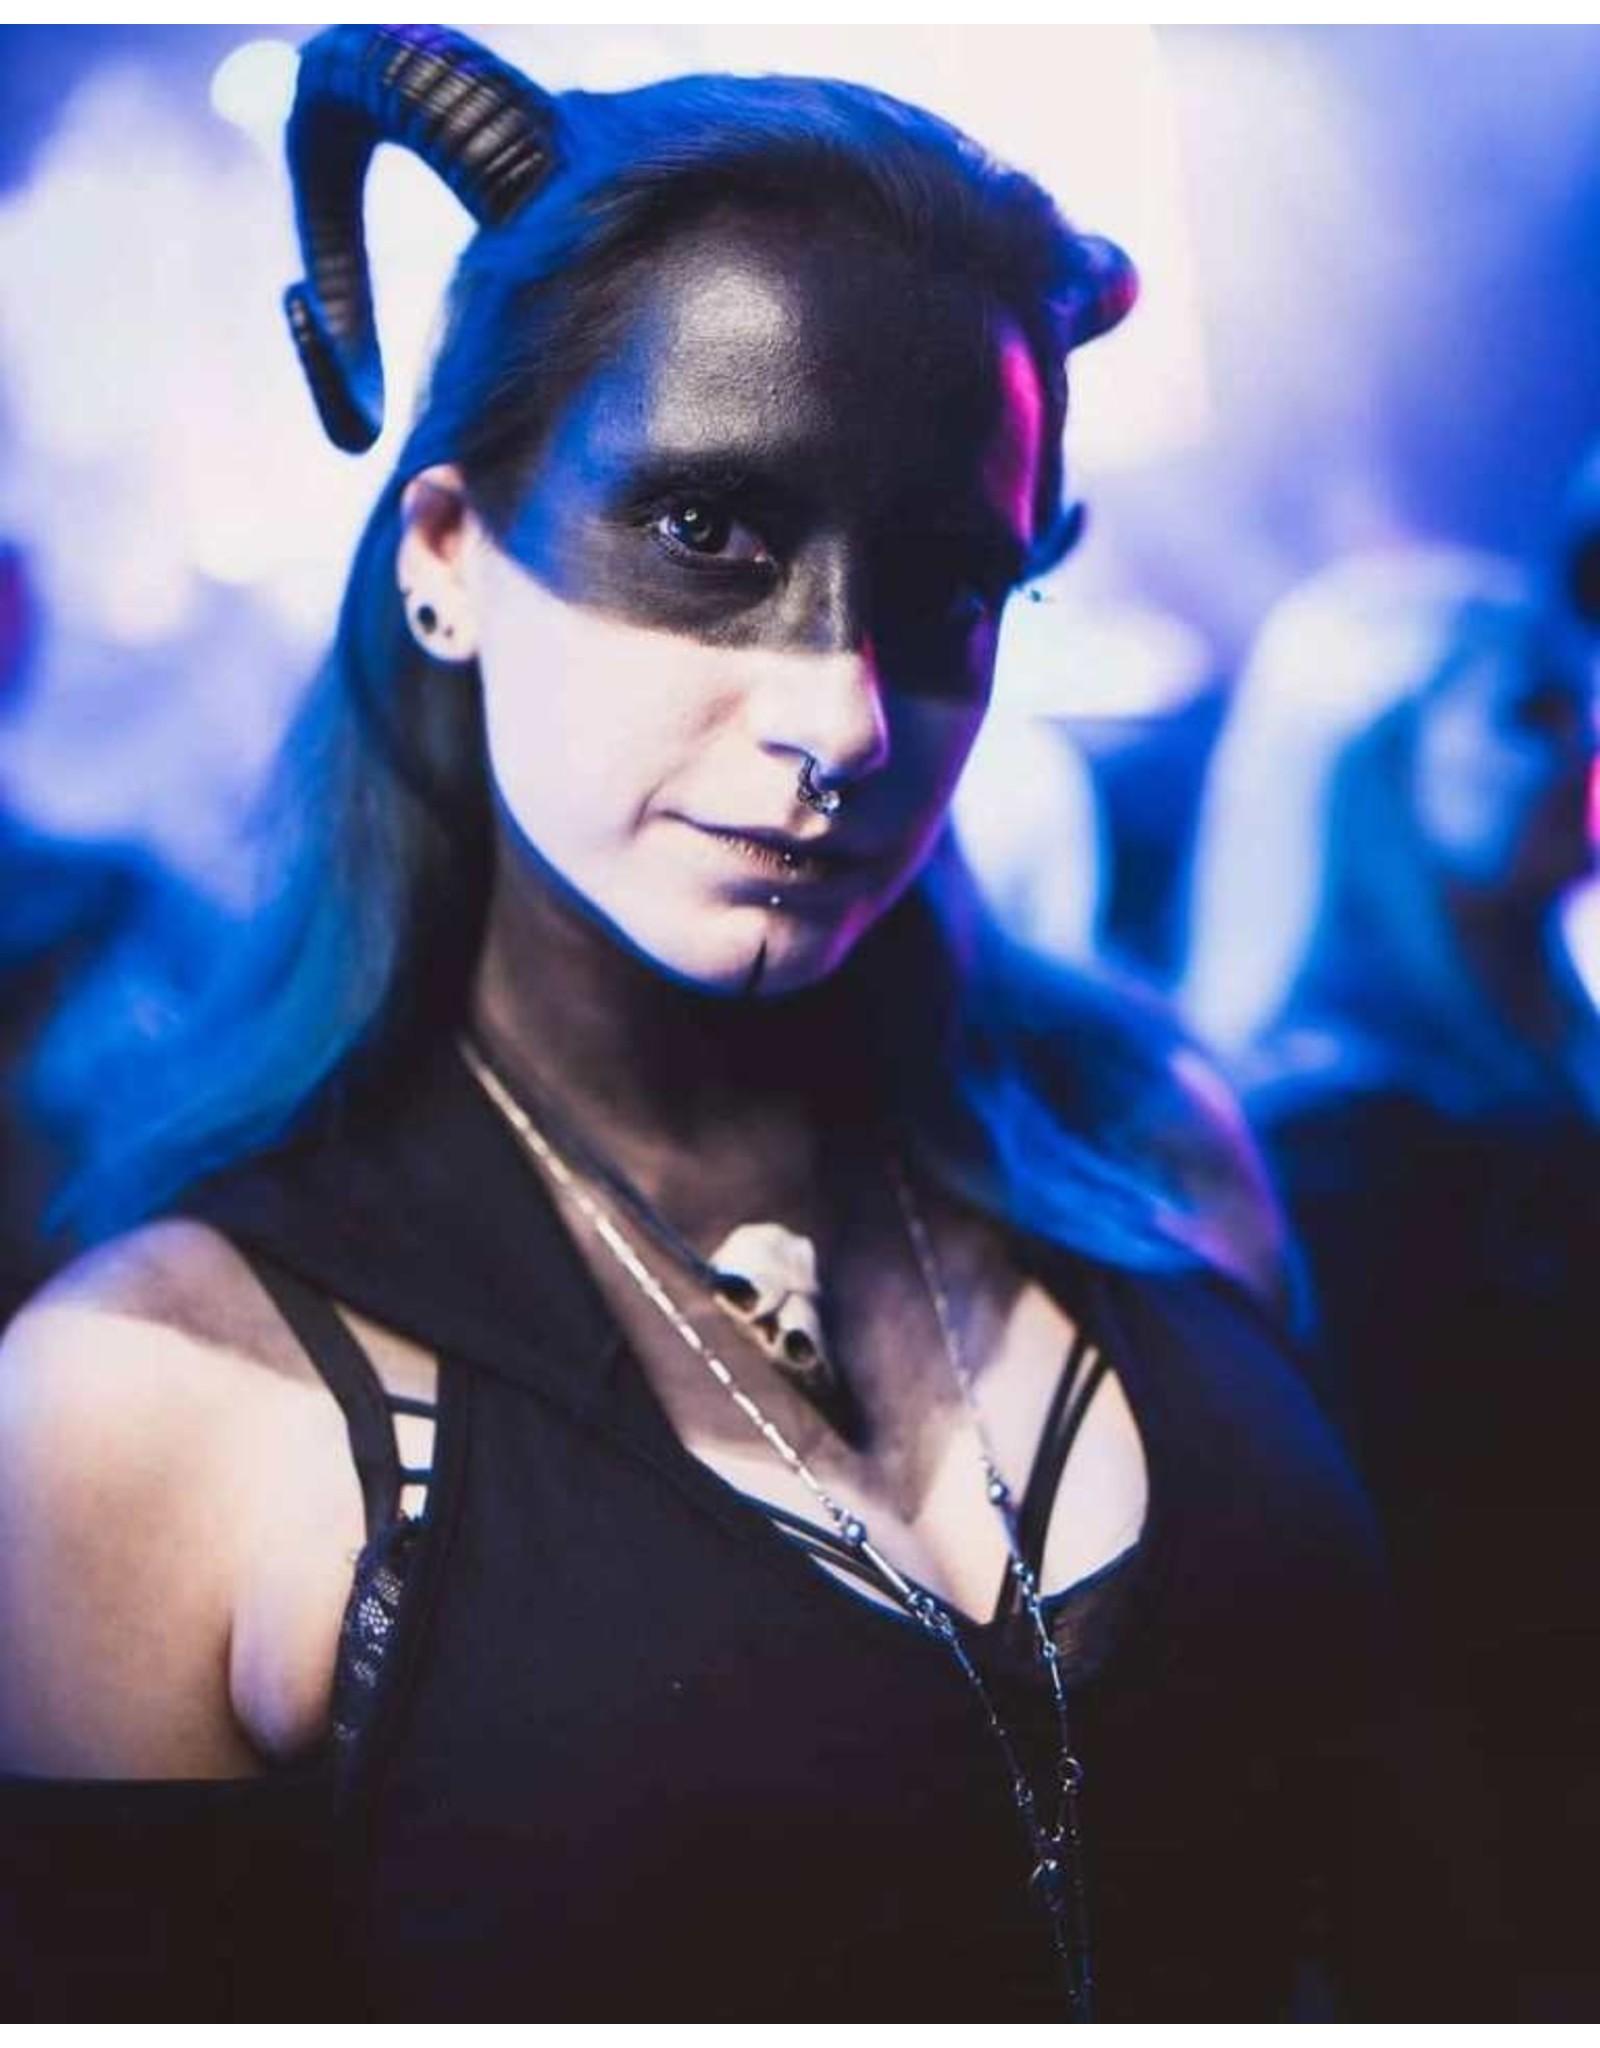 Restyle Gothic en Steampunk accessoires - Ram Hoorns Gothic en Fantasy haarband Sinister